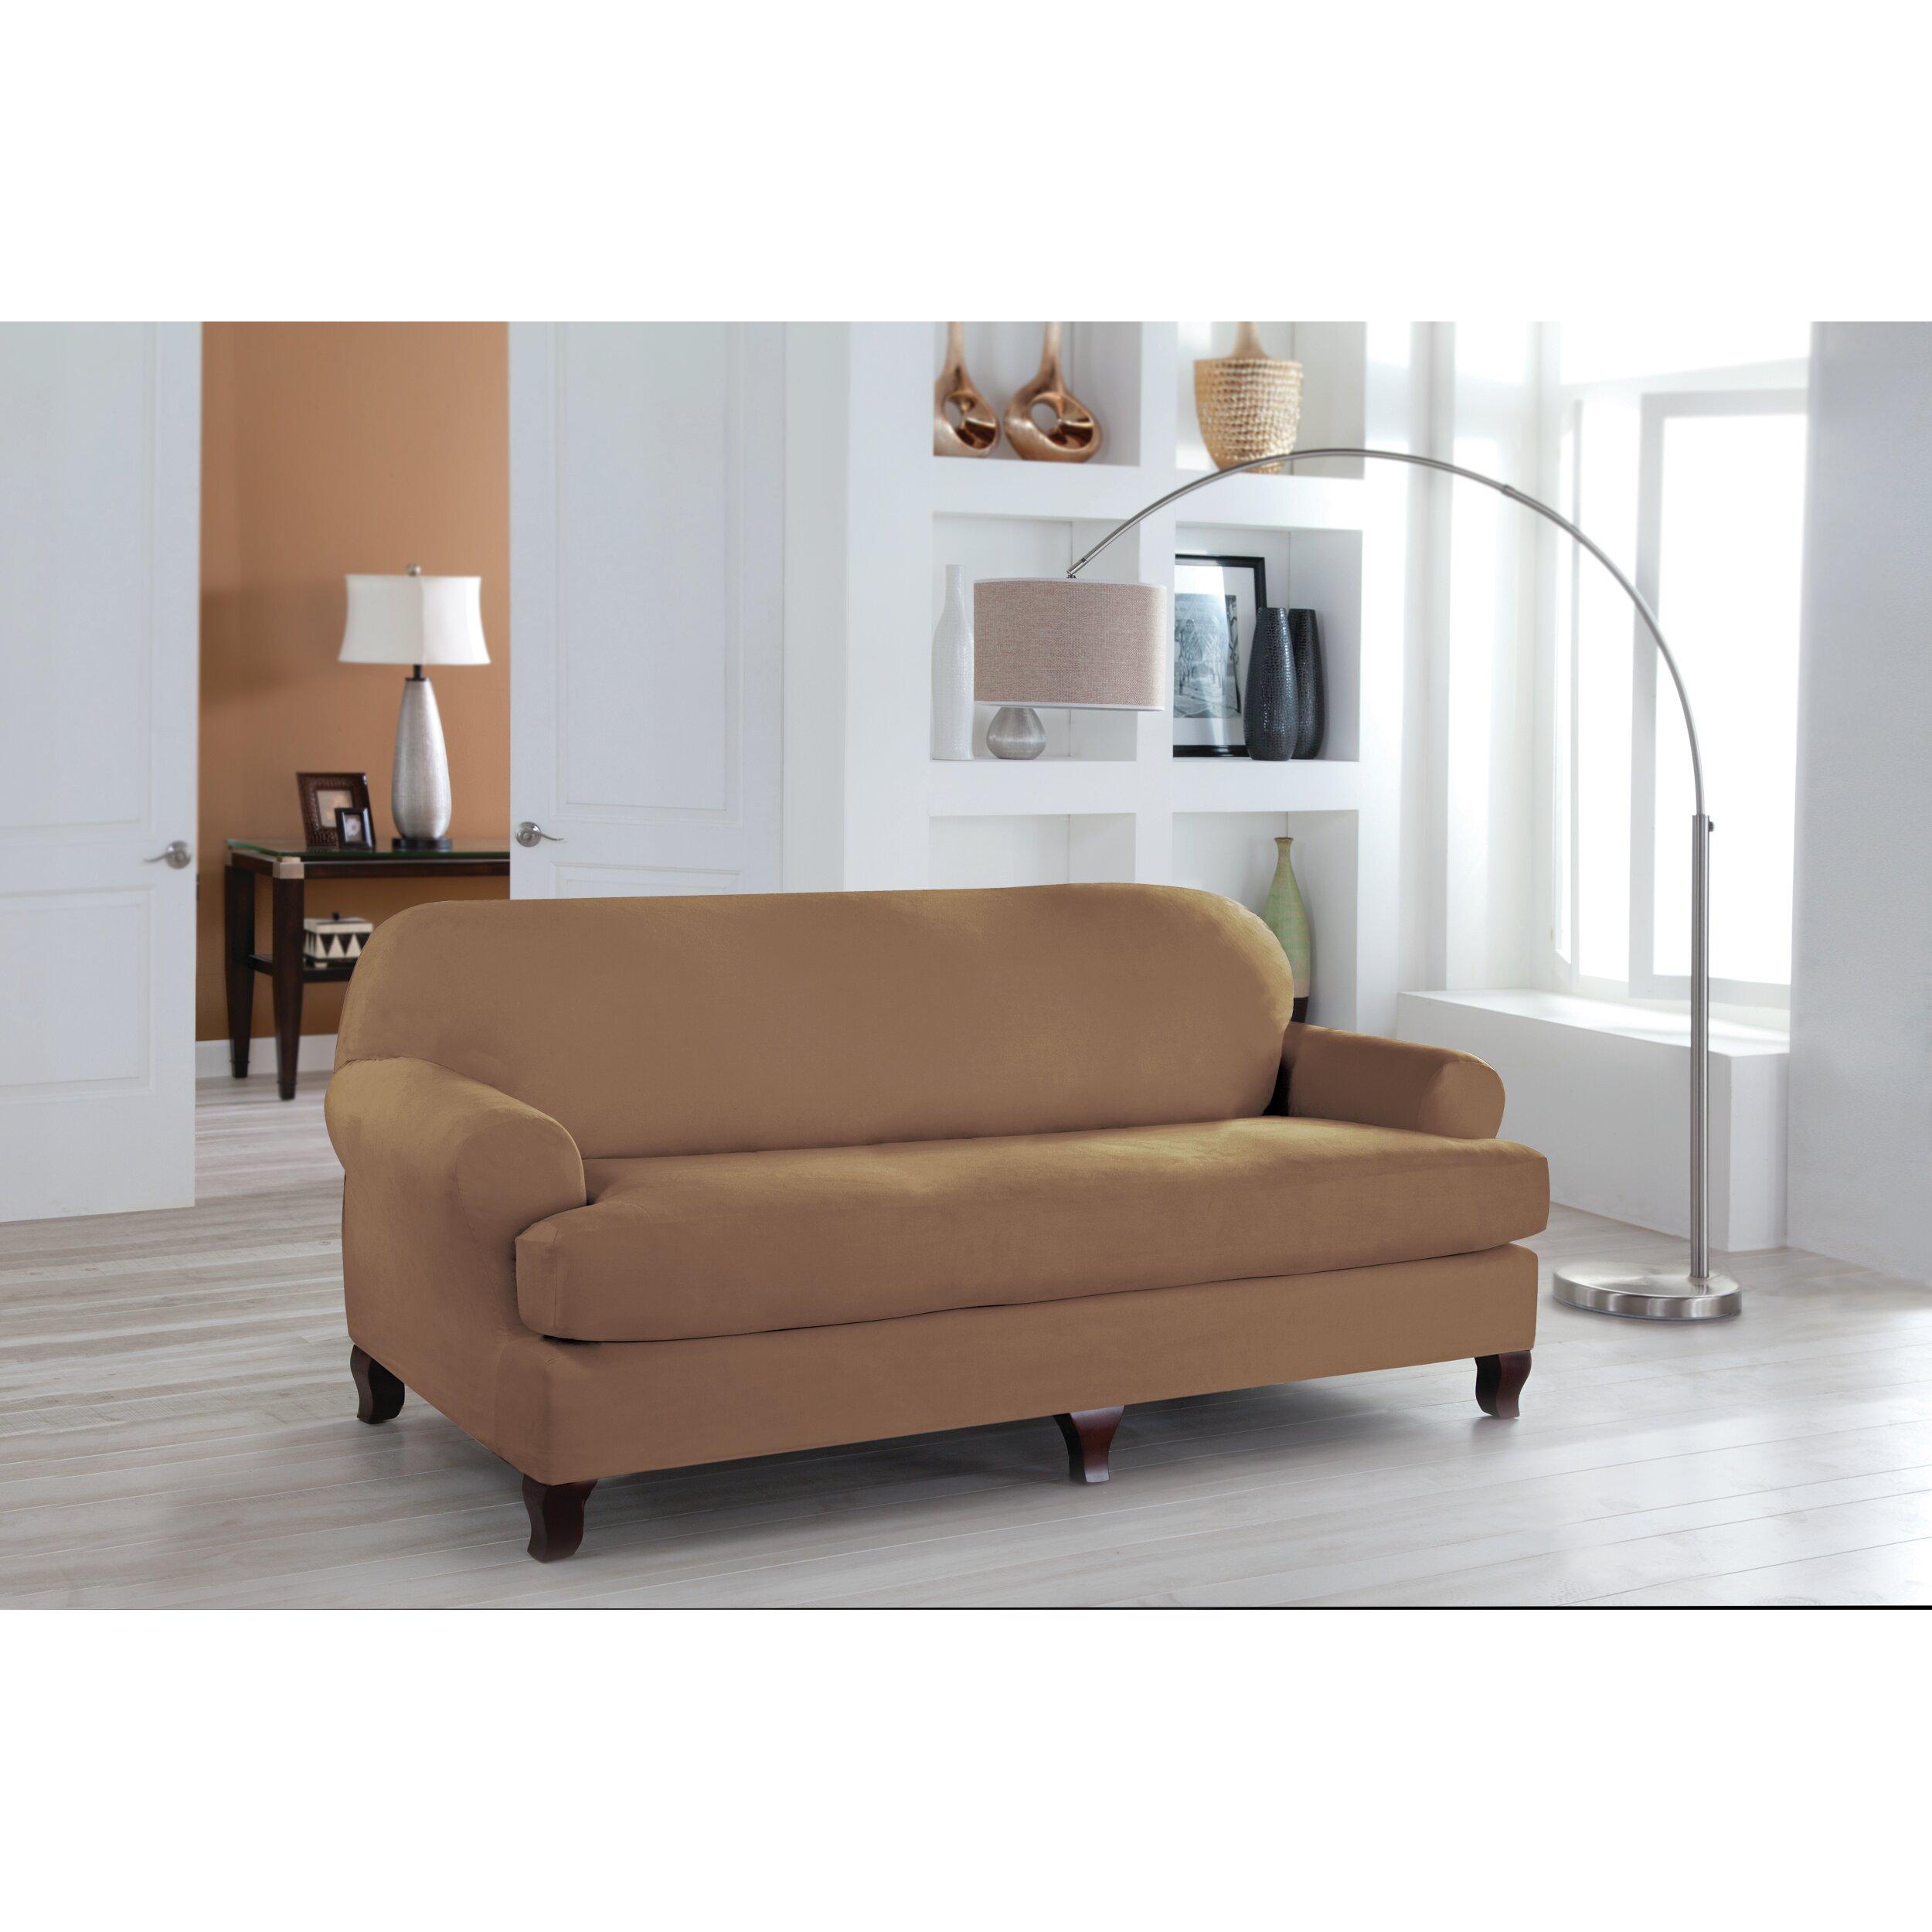 T Cushion Sofa Slip Cover: Perfect Fit Industries Tailor Fit Sofa T Cushion Slipcover